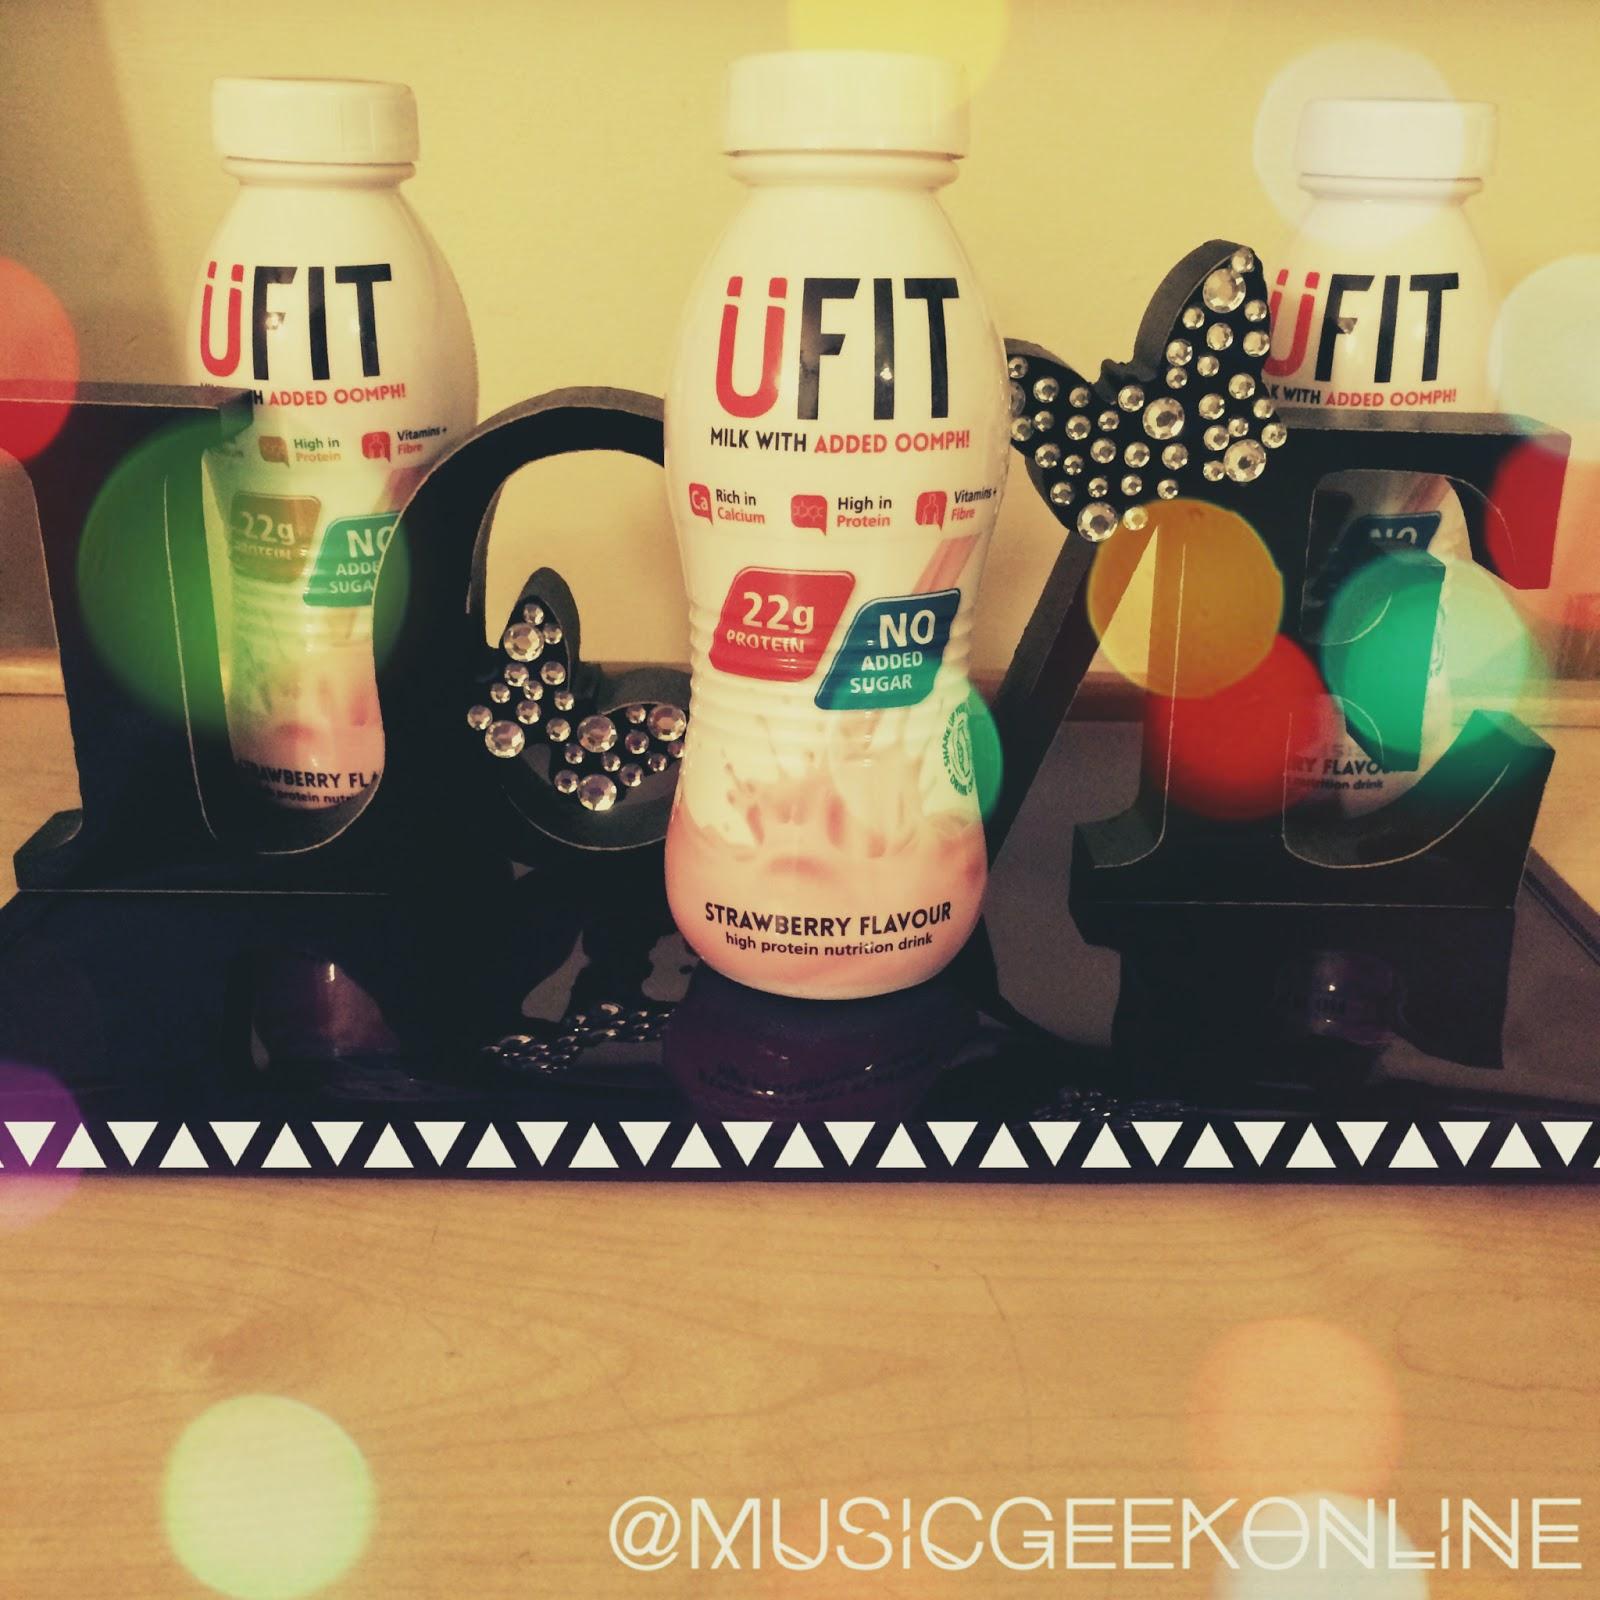 UFIT & Collagen+ Beauty Milk Review